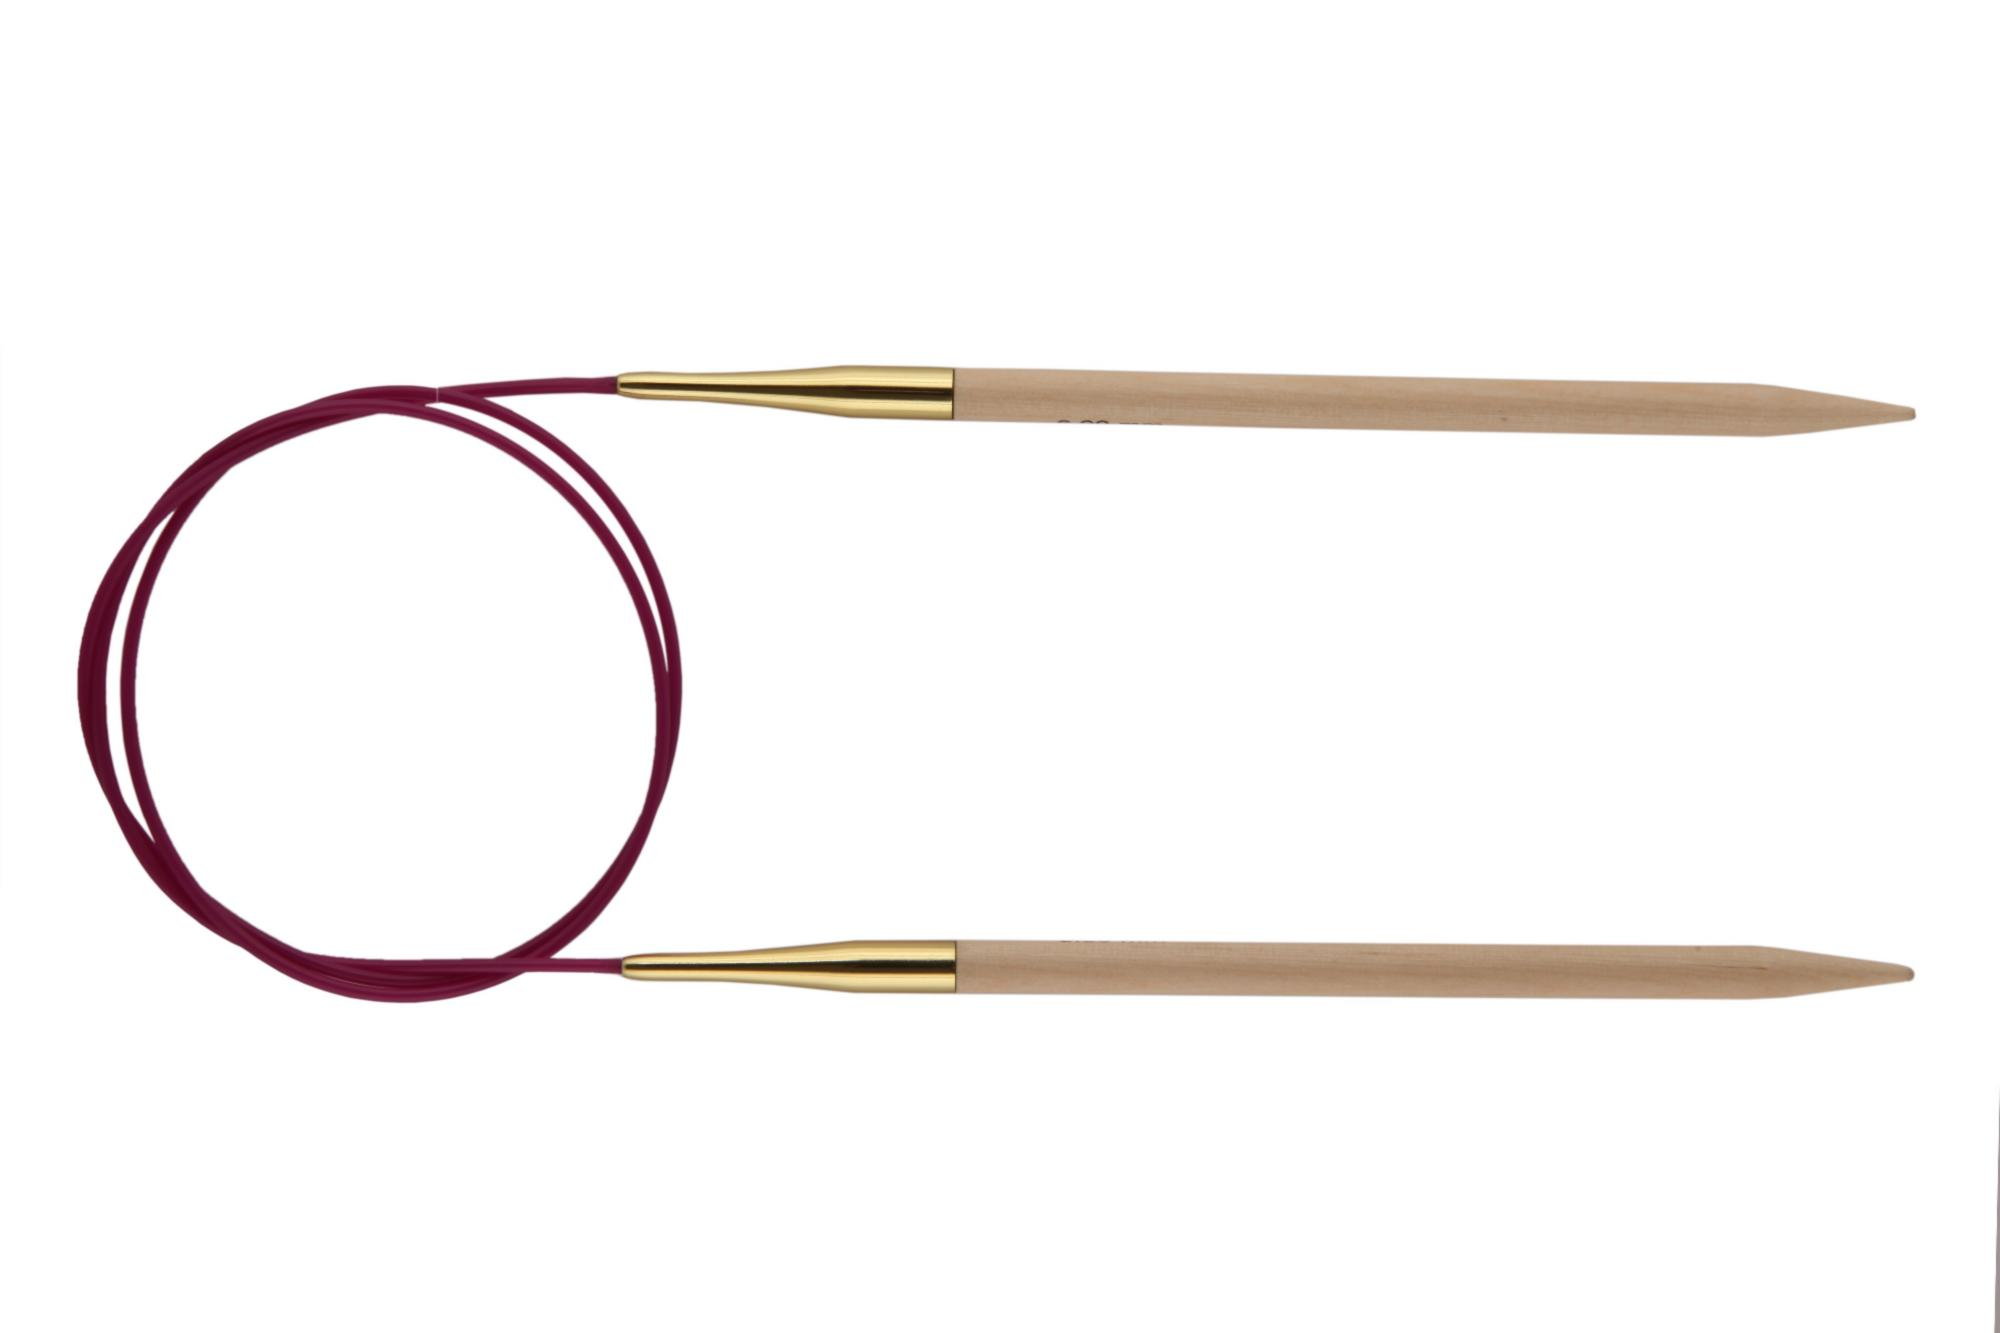 Спицы круговые 150 см Basix Birch Wood KnitPro, 35363, 6.50 мм